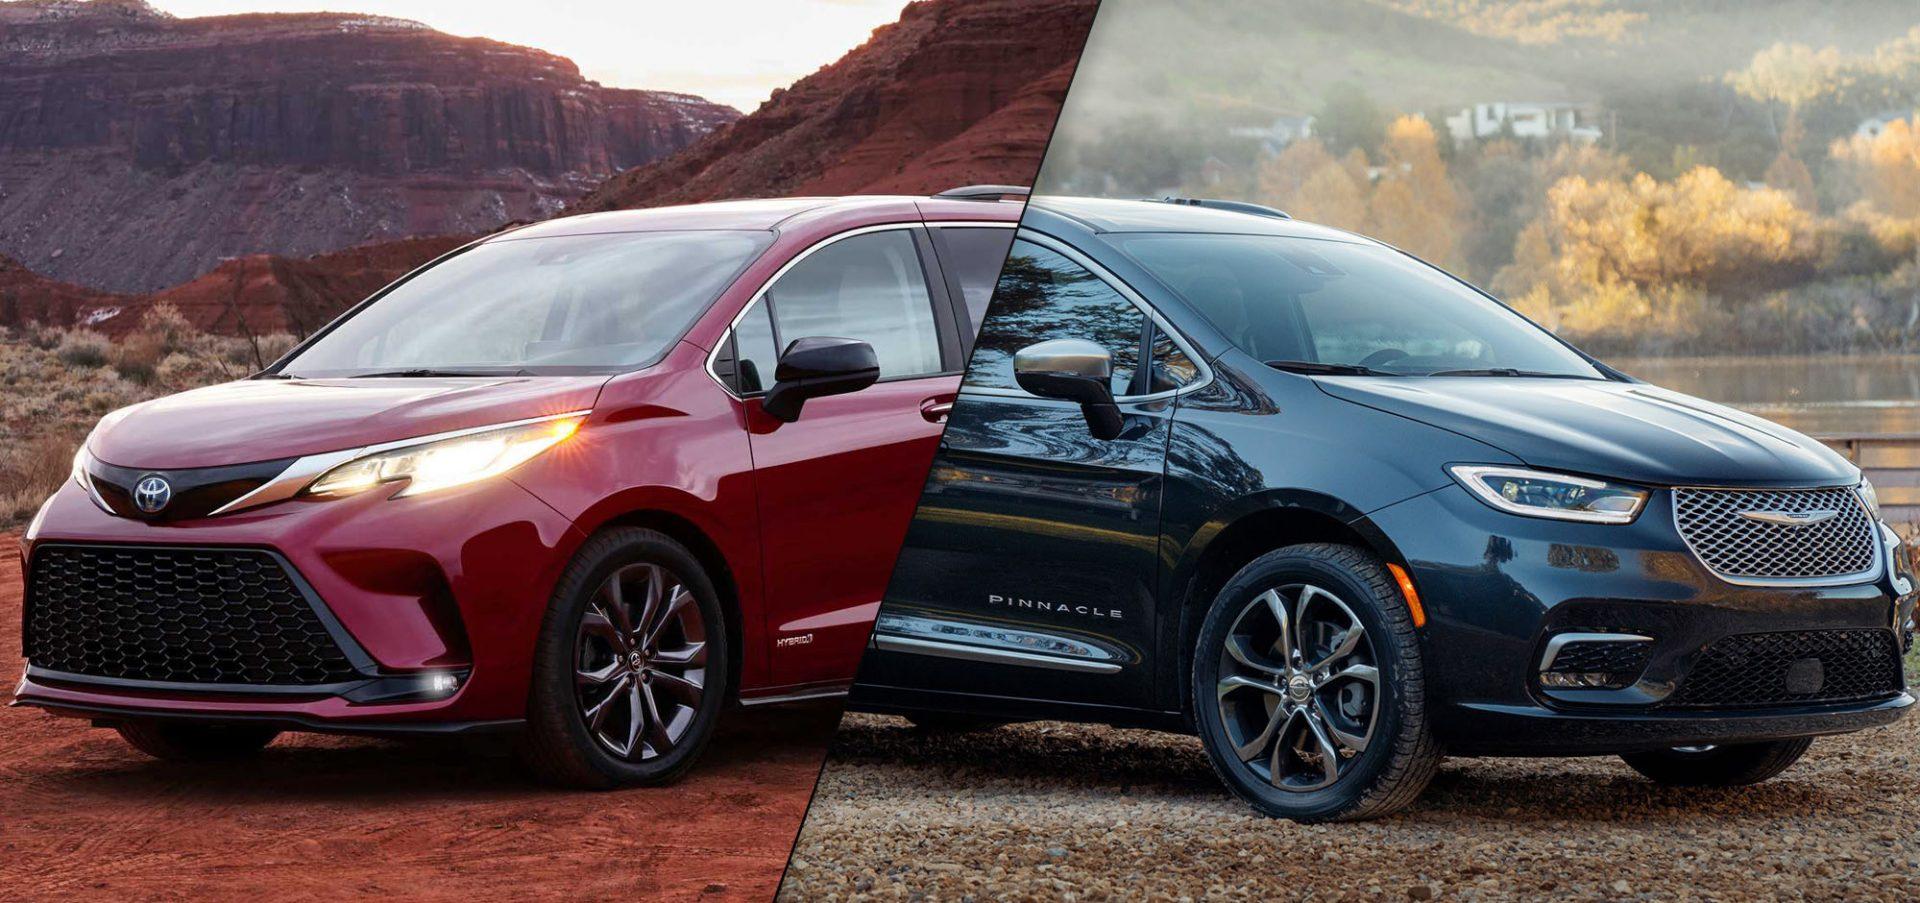 2021 Toyota Sienna vs 2021 Chrysler Pacifica